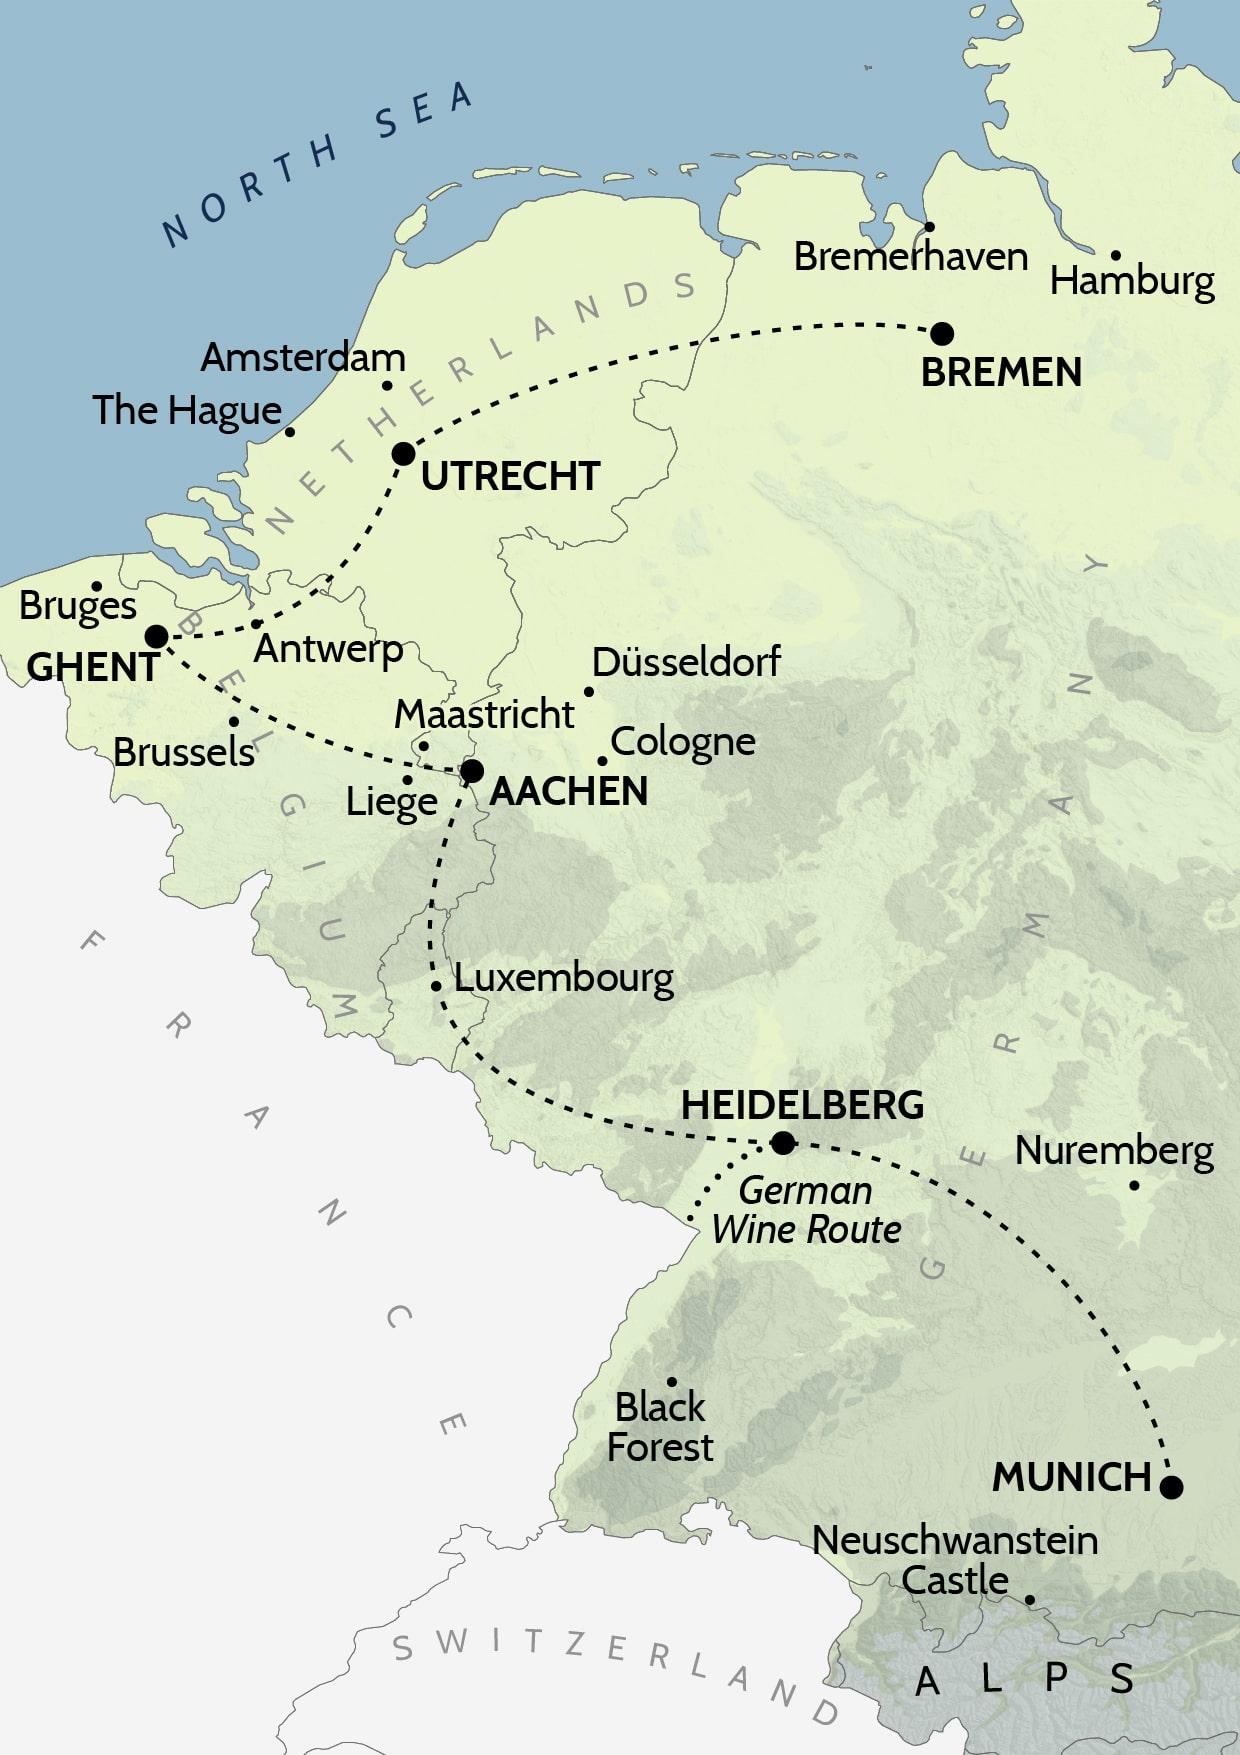 5x5_Germany_map-01 (1)-min